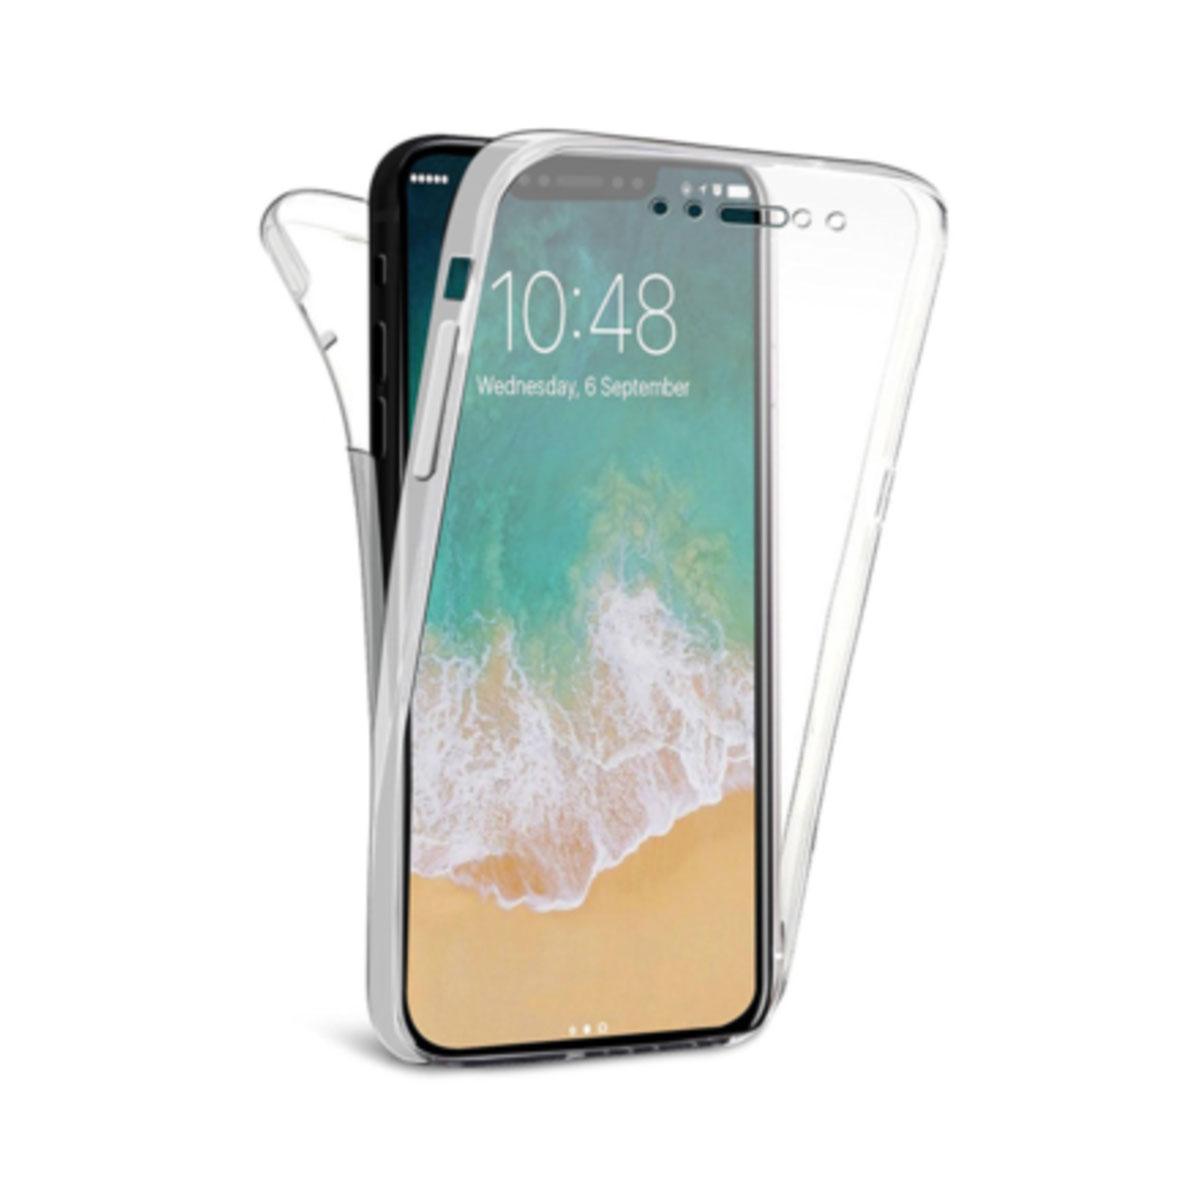 coque iphone 6 double face transparent